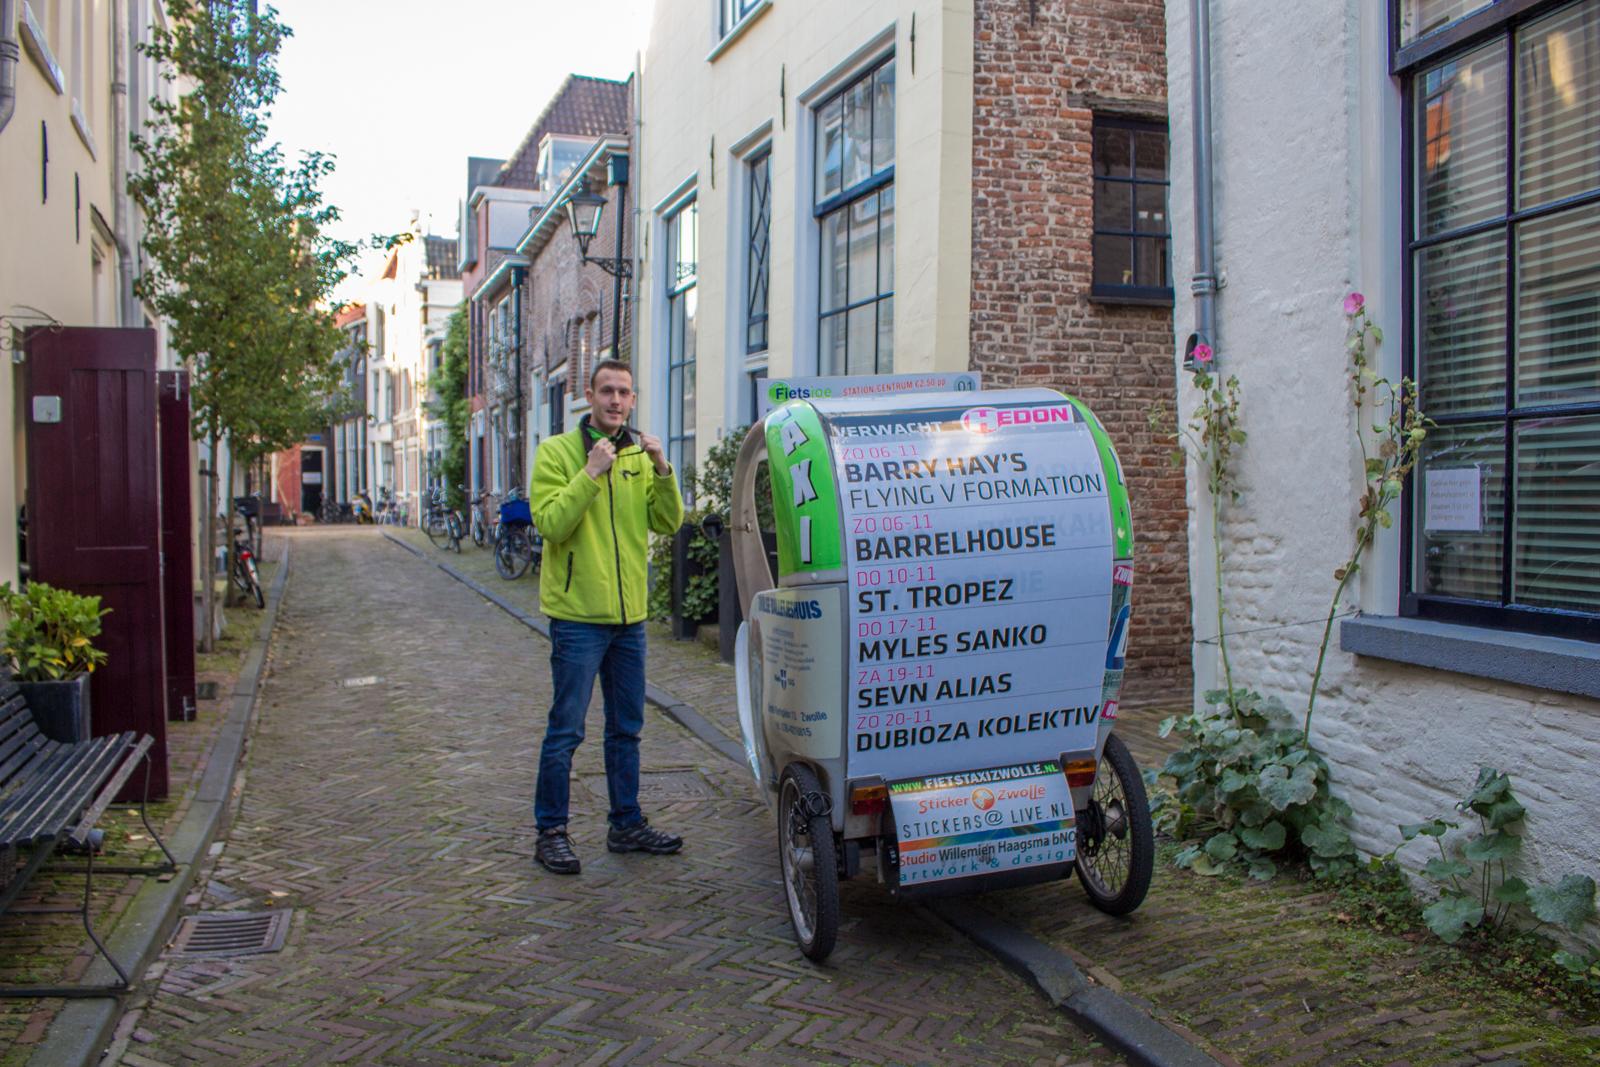 Fahrradtaxi, Altstadt, Zwolle, Taxi, Fahrradtaxi, Genießertour, Hansestadt, Holland